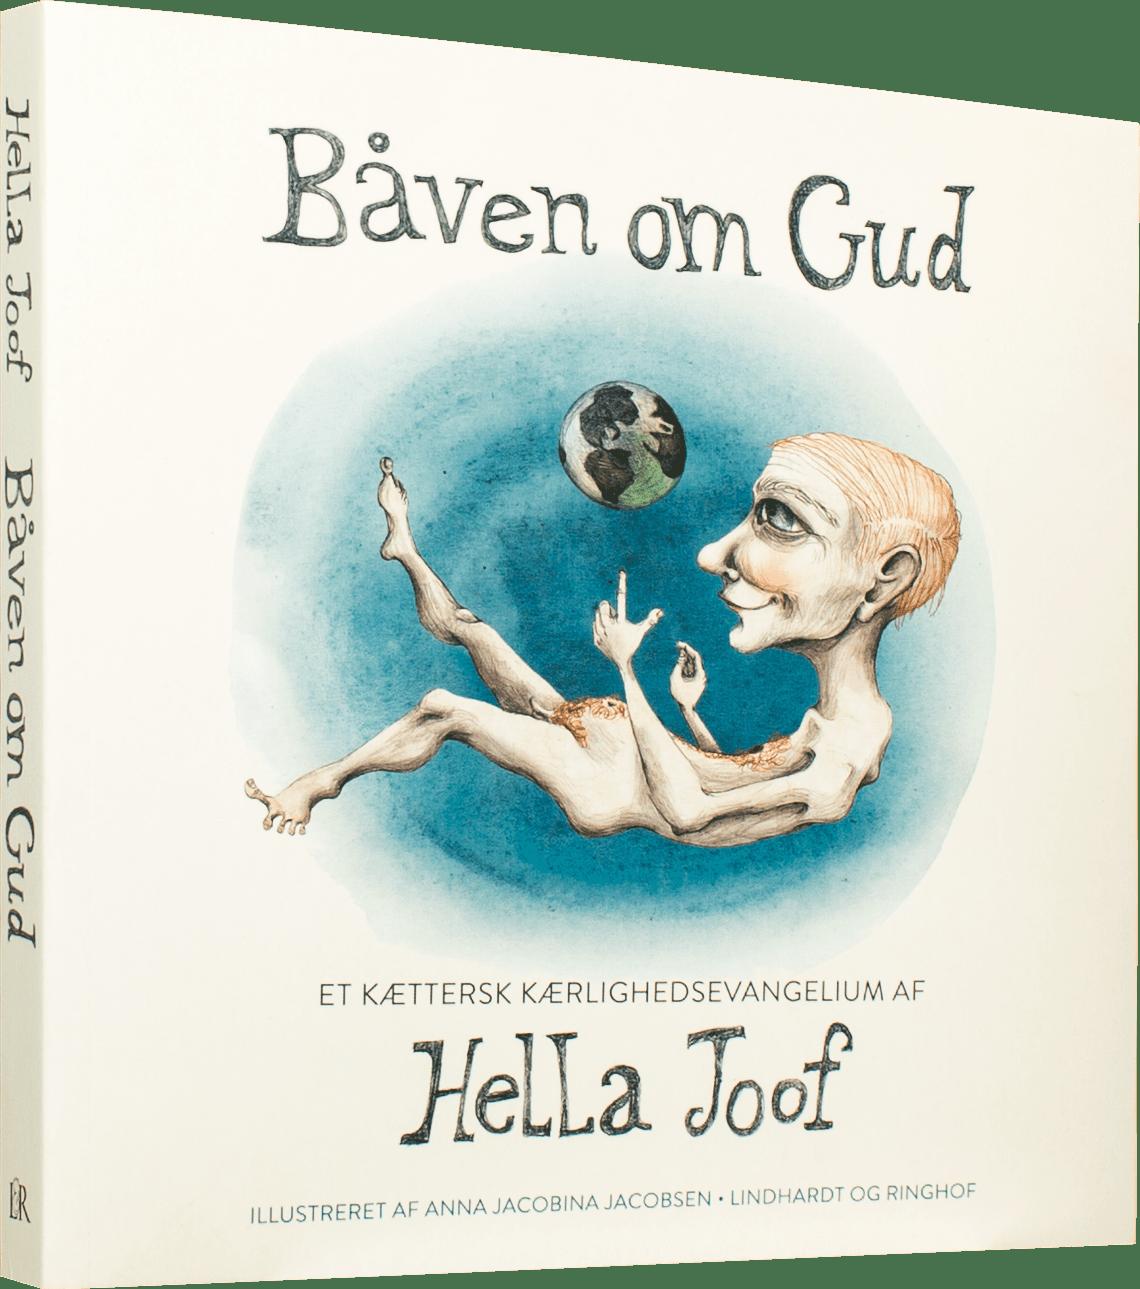 Båven om Gud, Hella Joof, Anna Jacobina Jacobsen